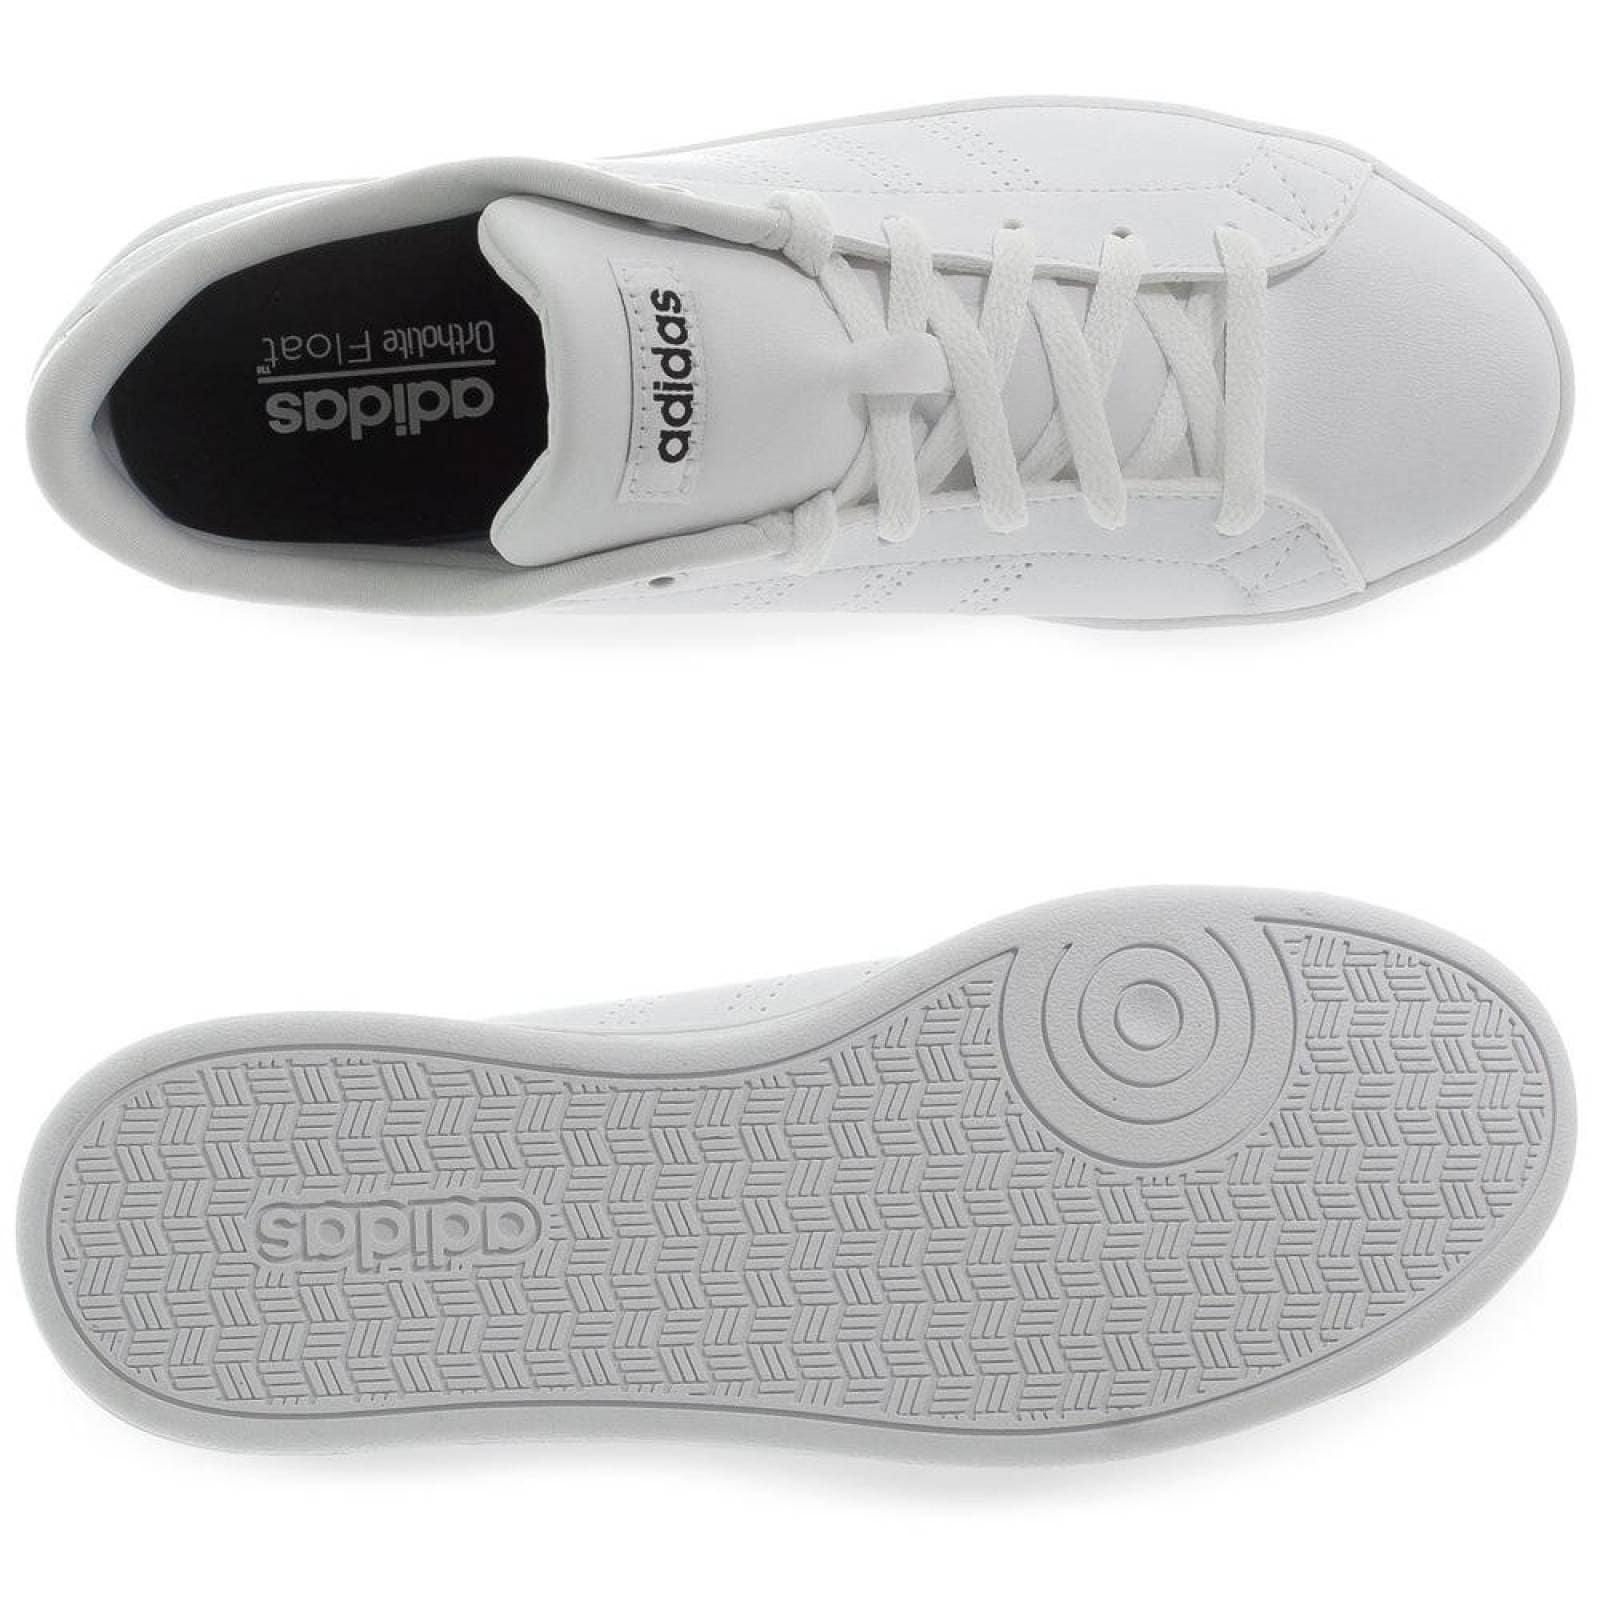 Zapatillas adidas Advantage Clean QT Blanco Rosa para mujer